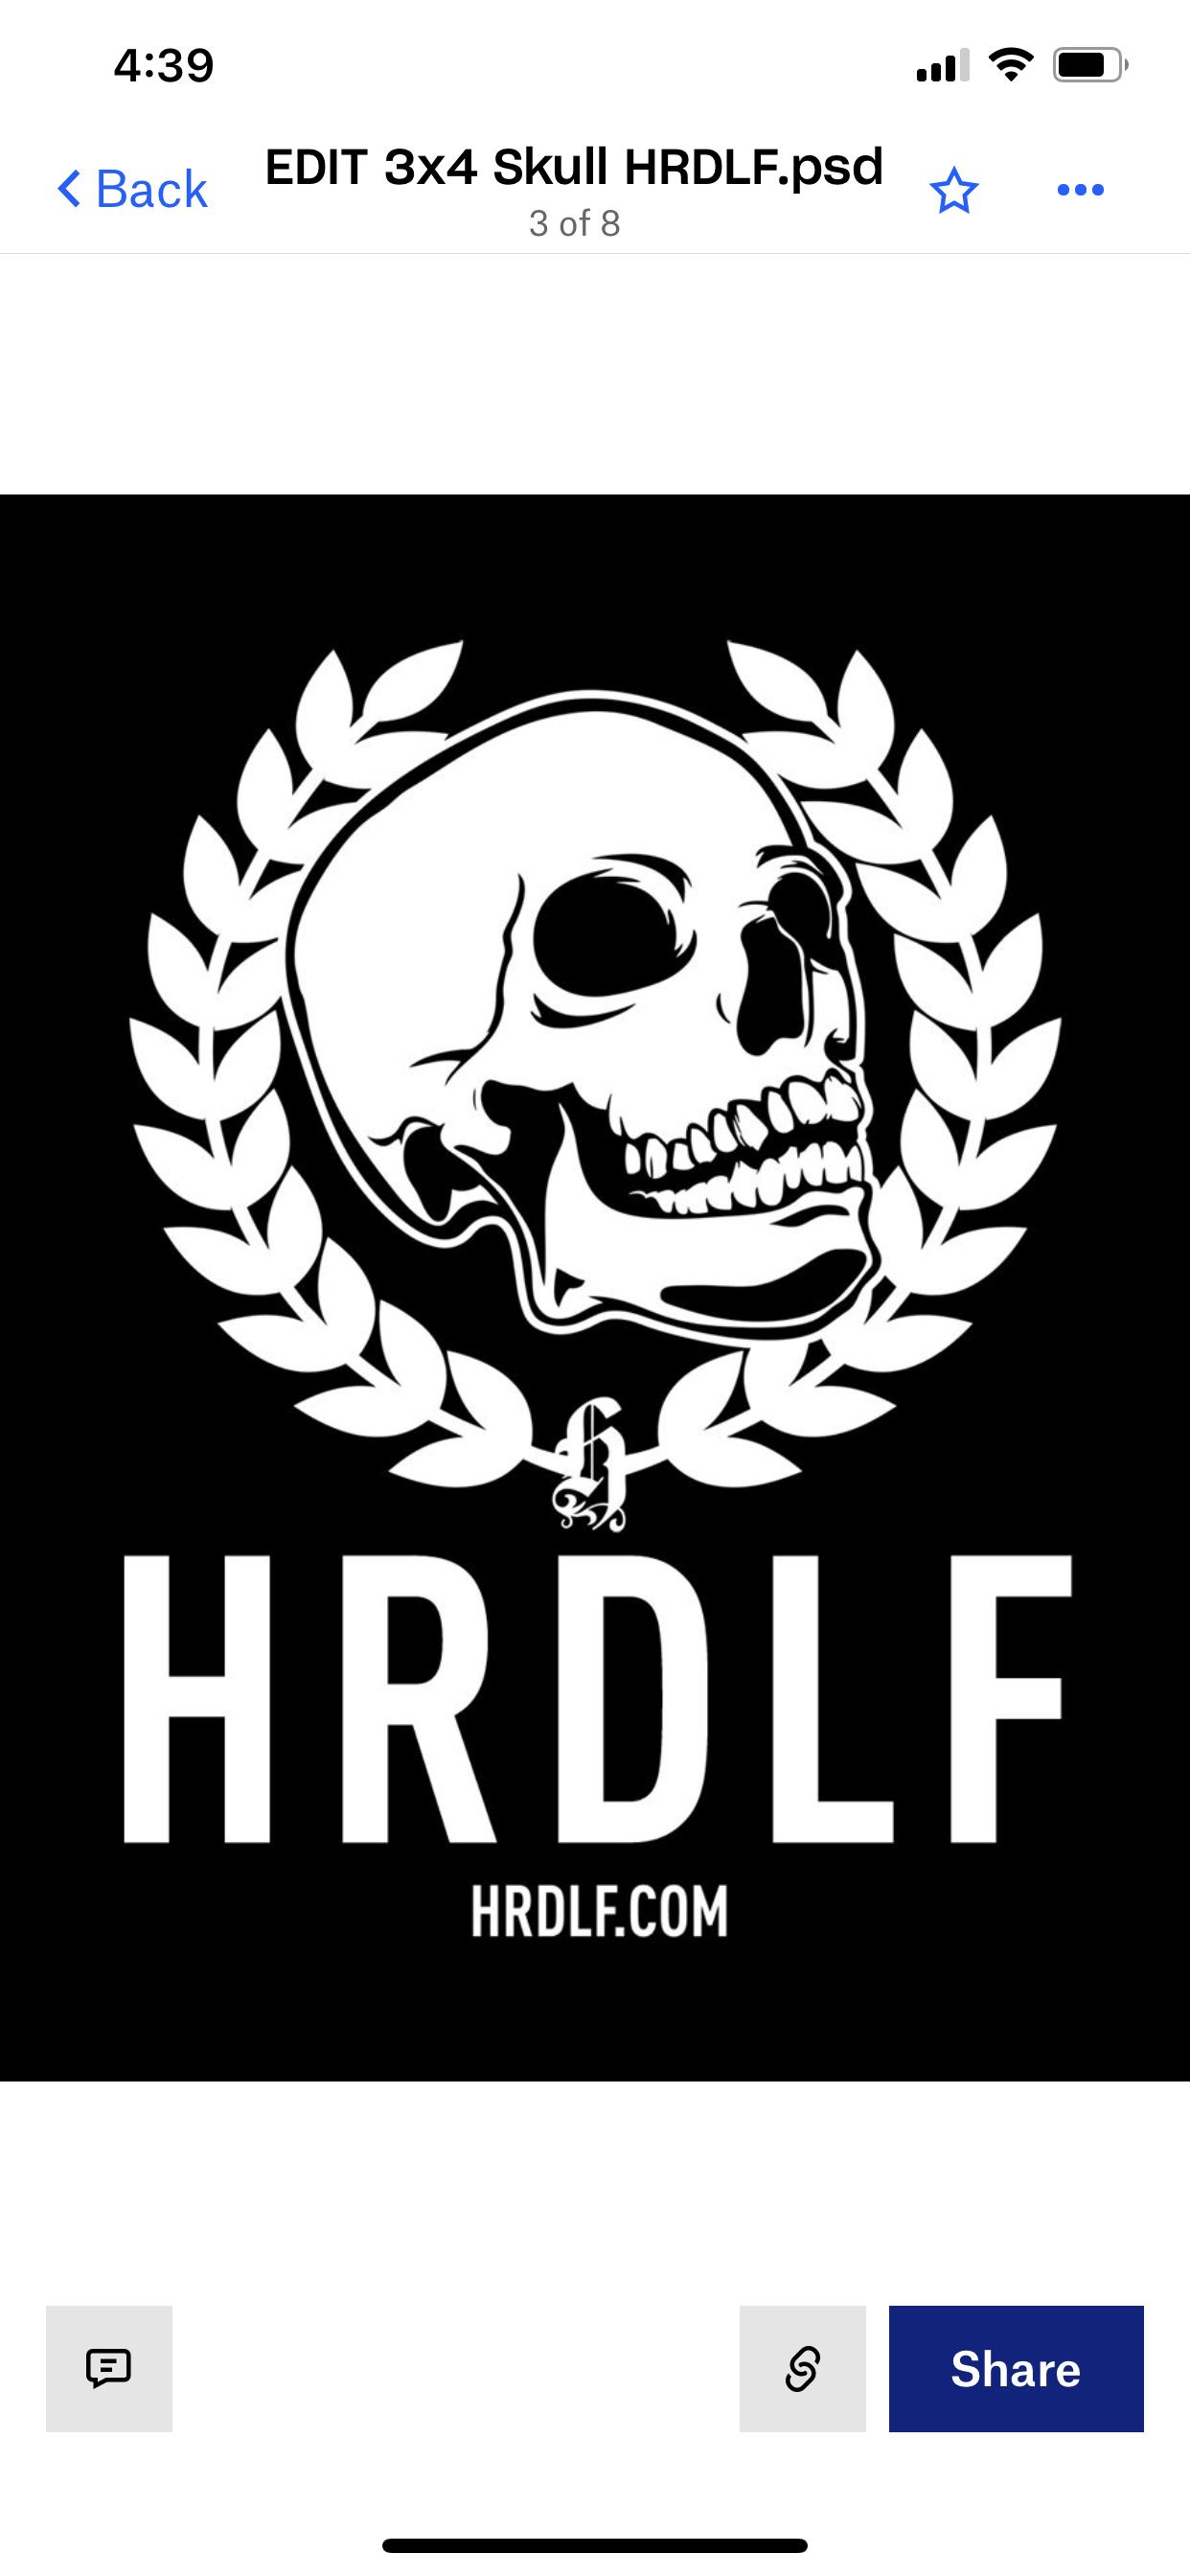 hrdlf21